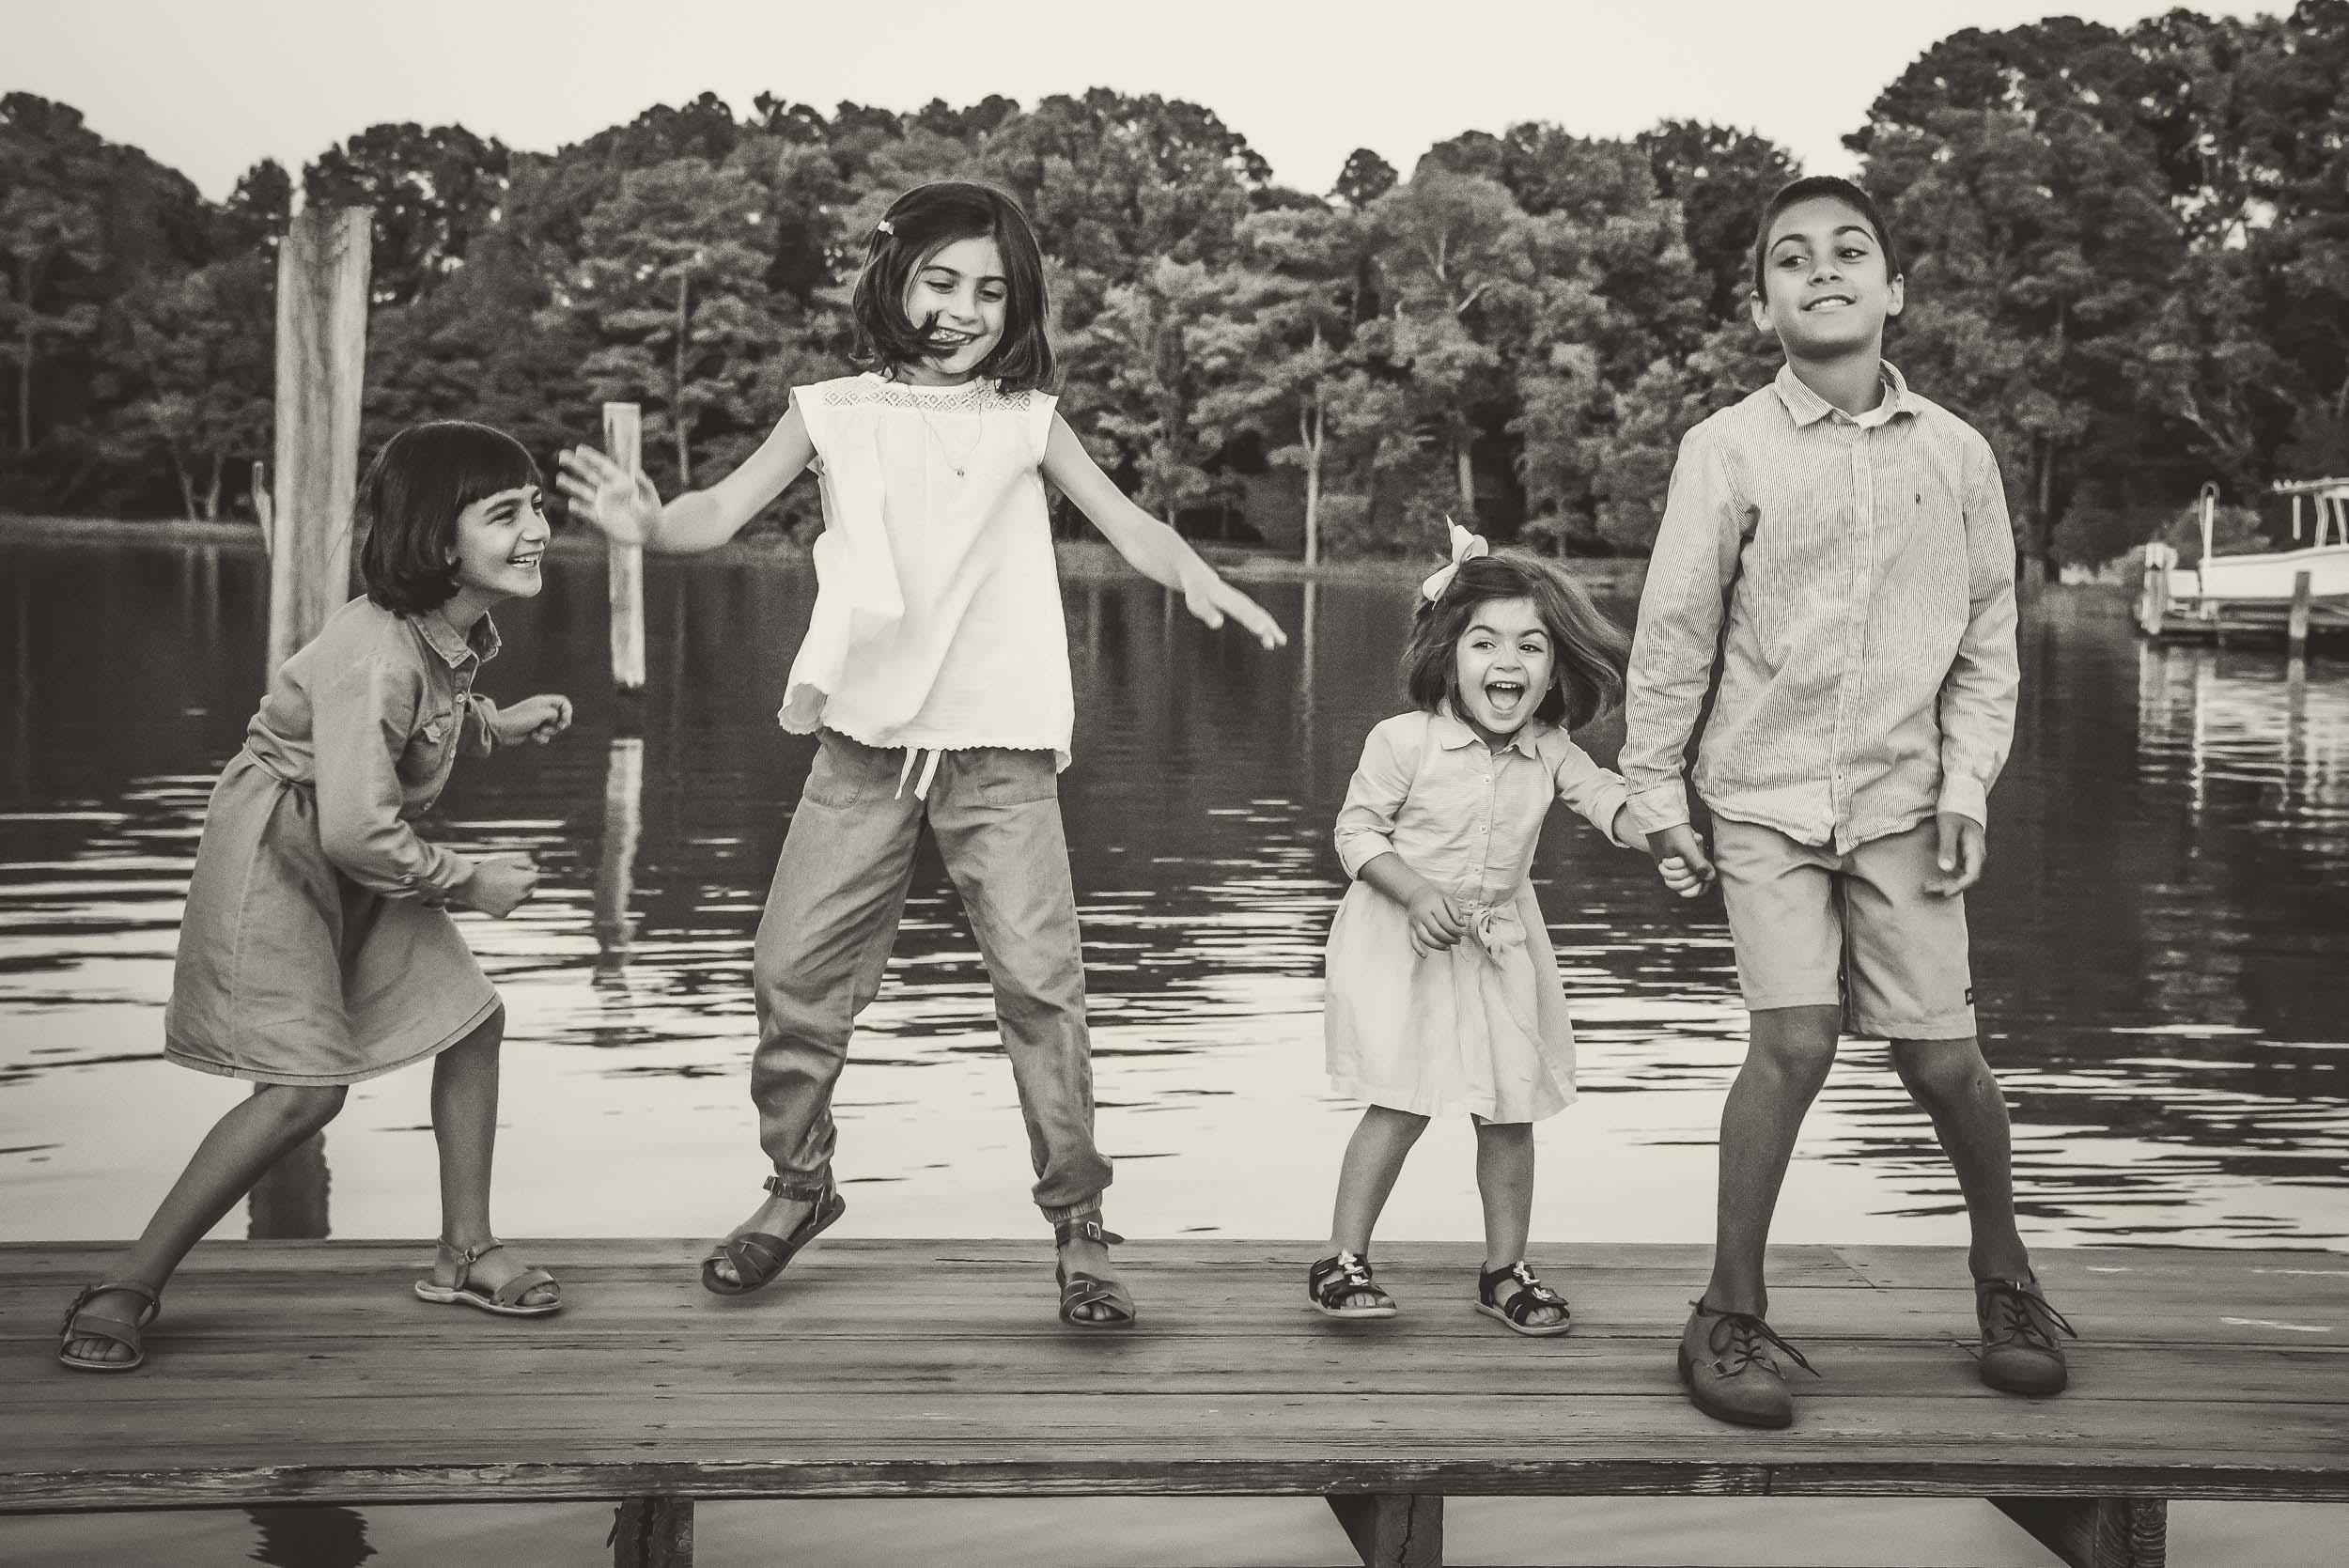 Family_Senior_Wedding_Maryland_Photographer_Sonny_and_Allison_Favorites_Easton_Crofton_Oxford-69.jpg